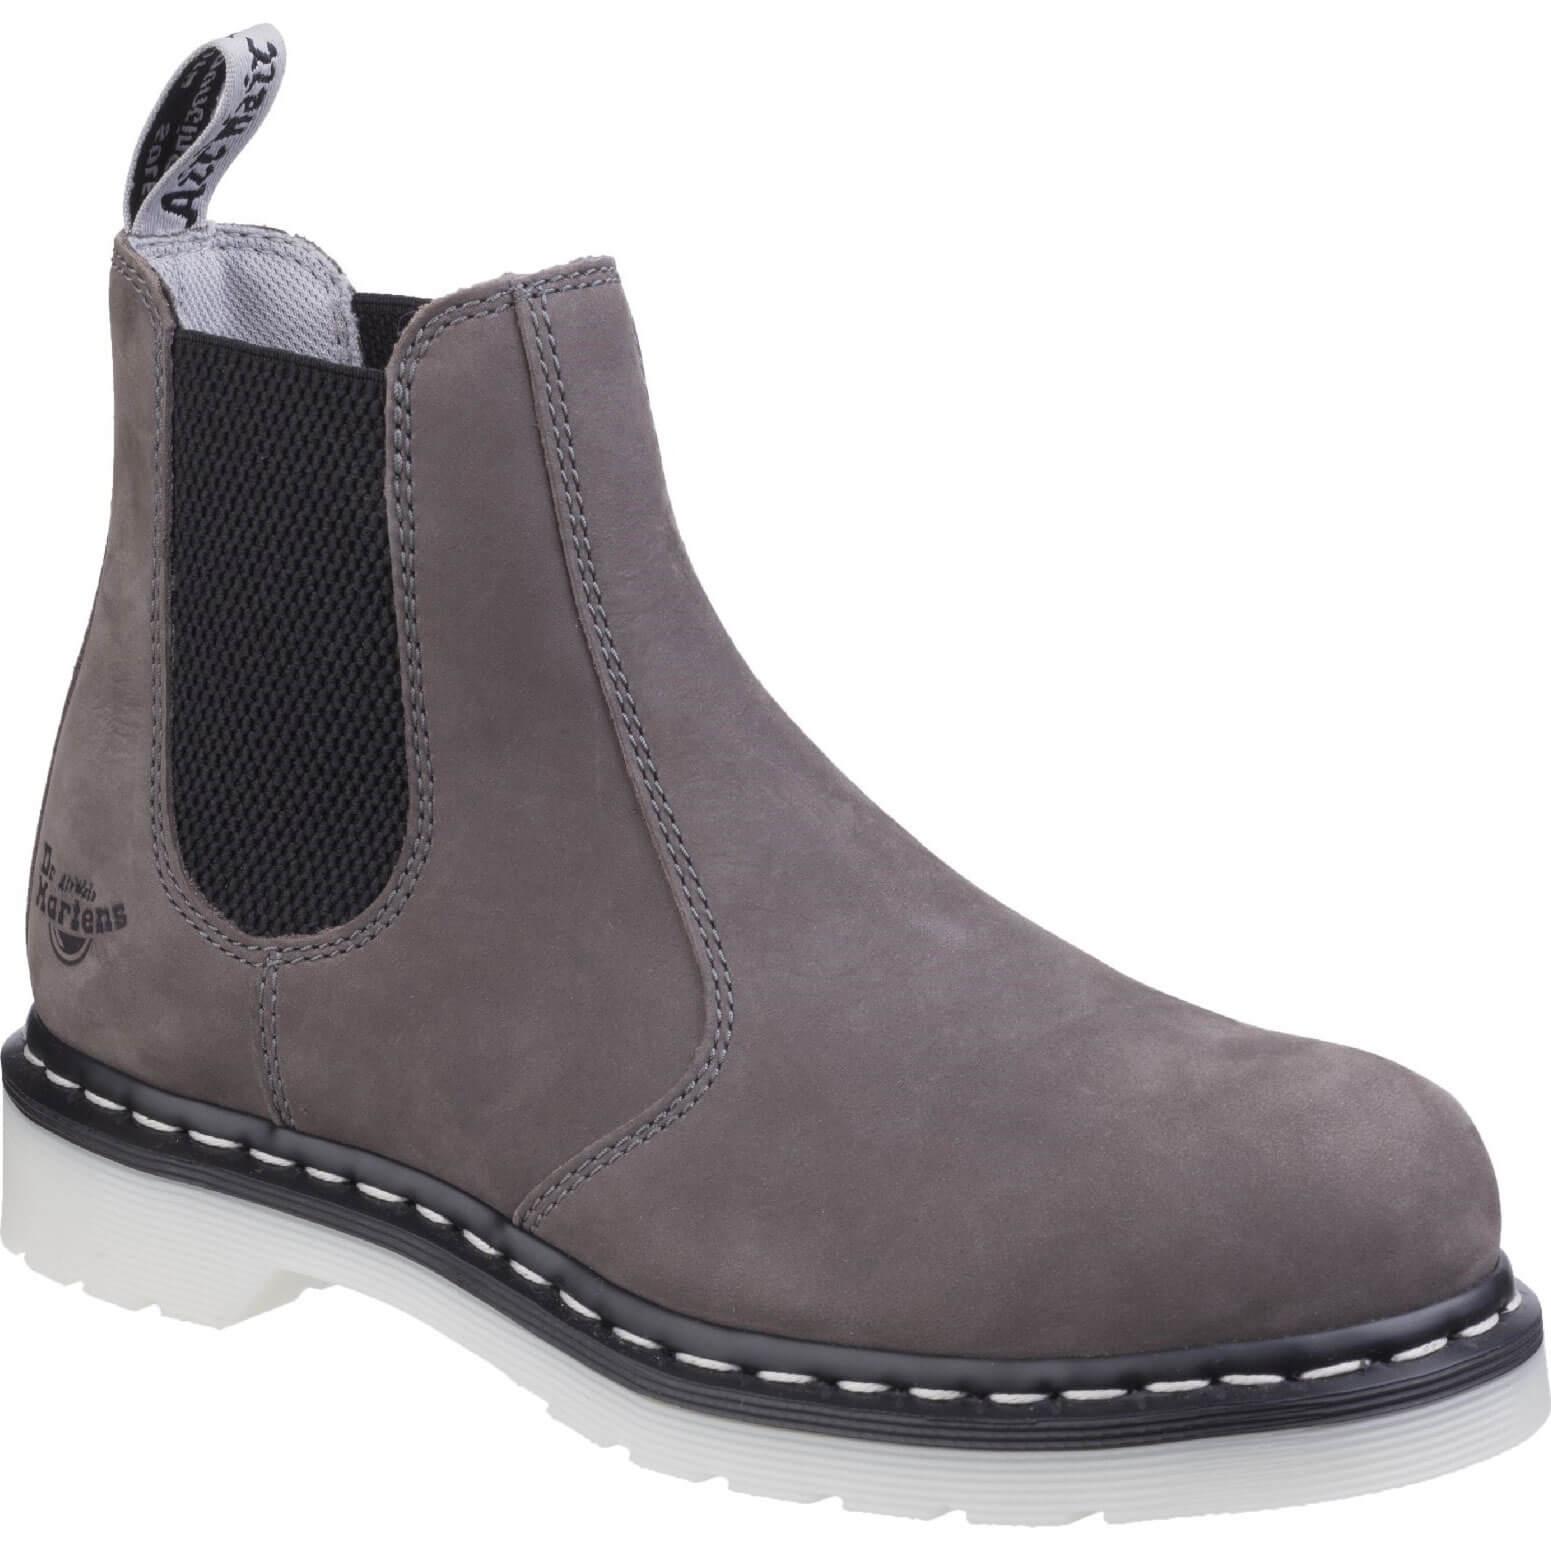 CHEAP Dr Martens Mens Arbar St Chelsea Work Boots Grey Size 4 – Men's Footwear